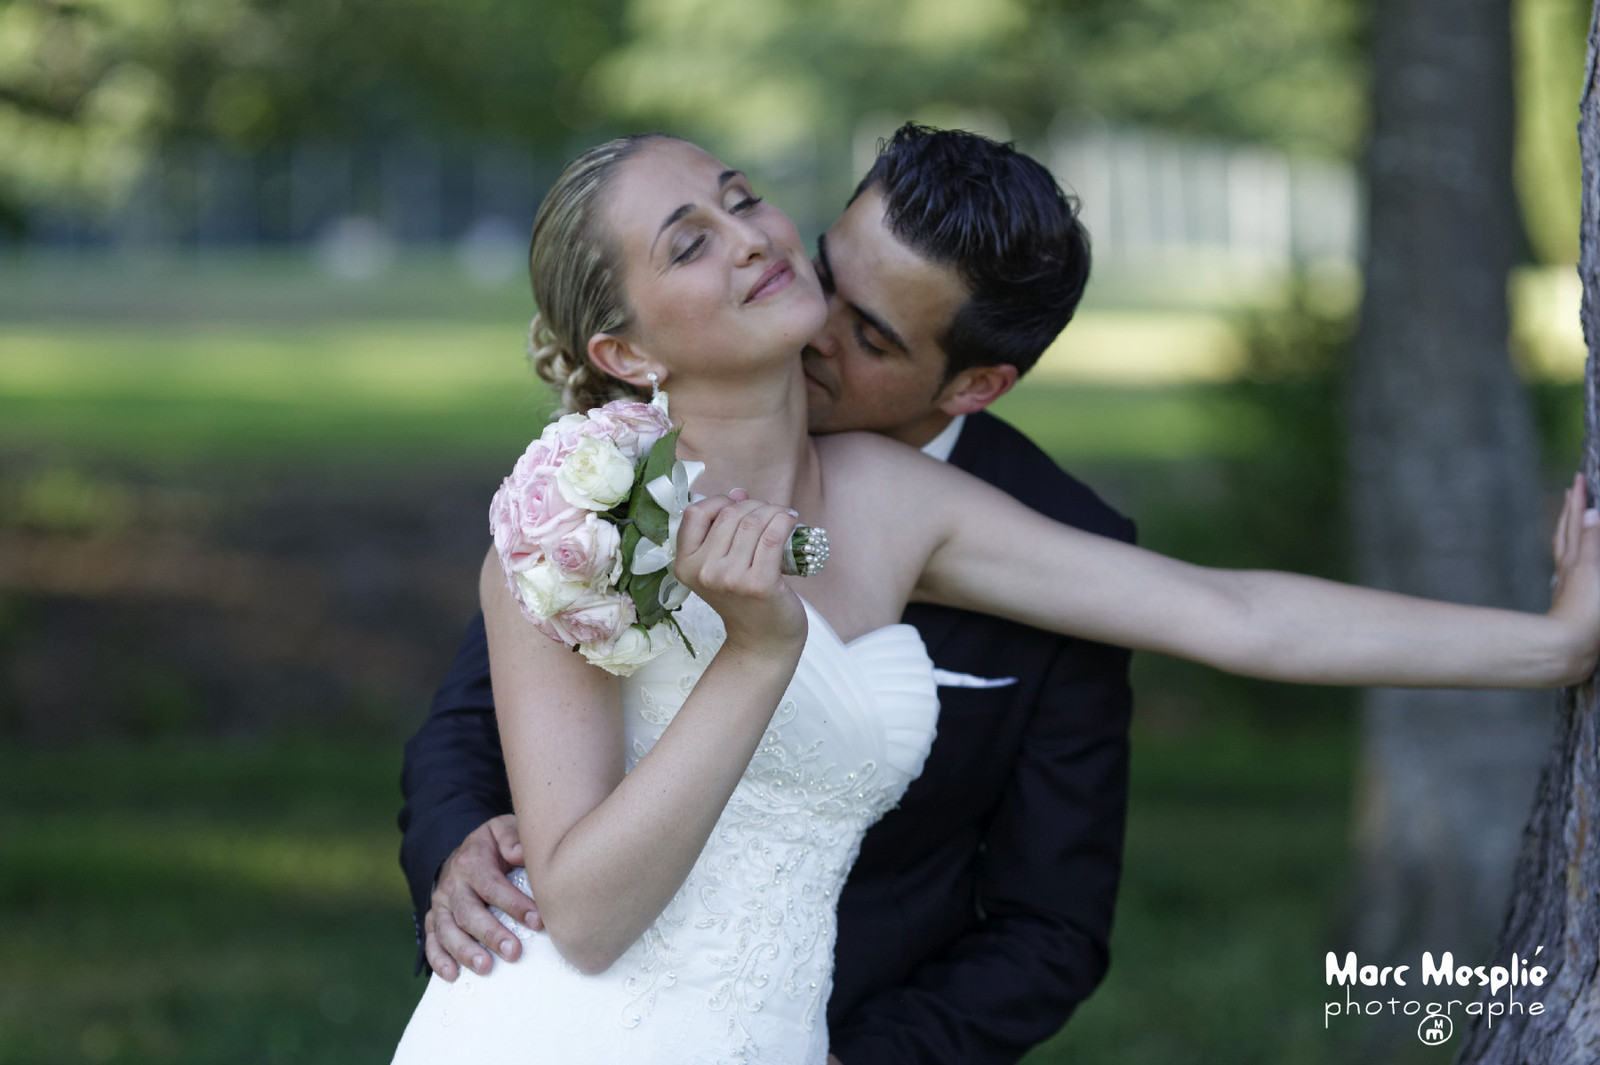 marc mesplie photographe mariage ariege aude occitanie wedding ariege - Photographe Mariage Ariege